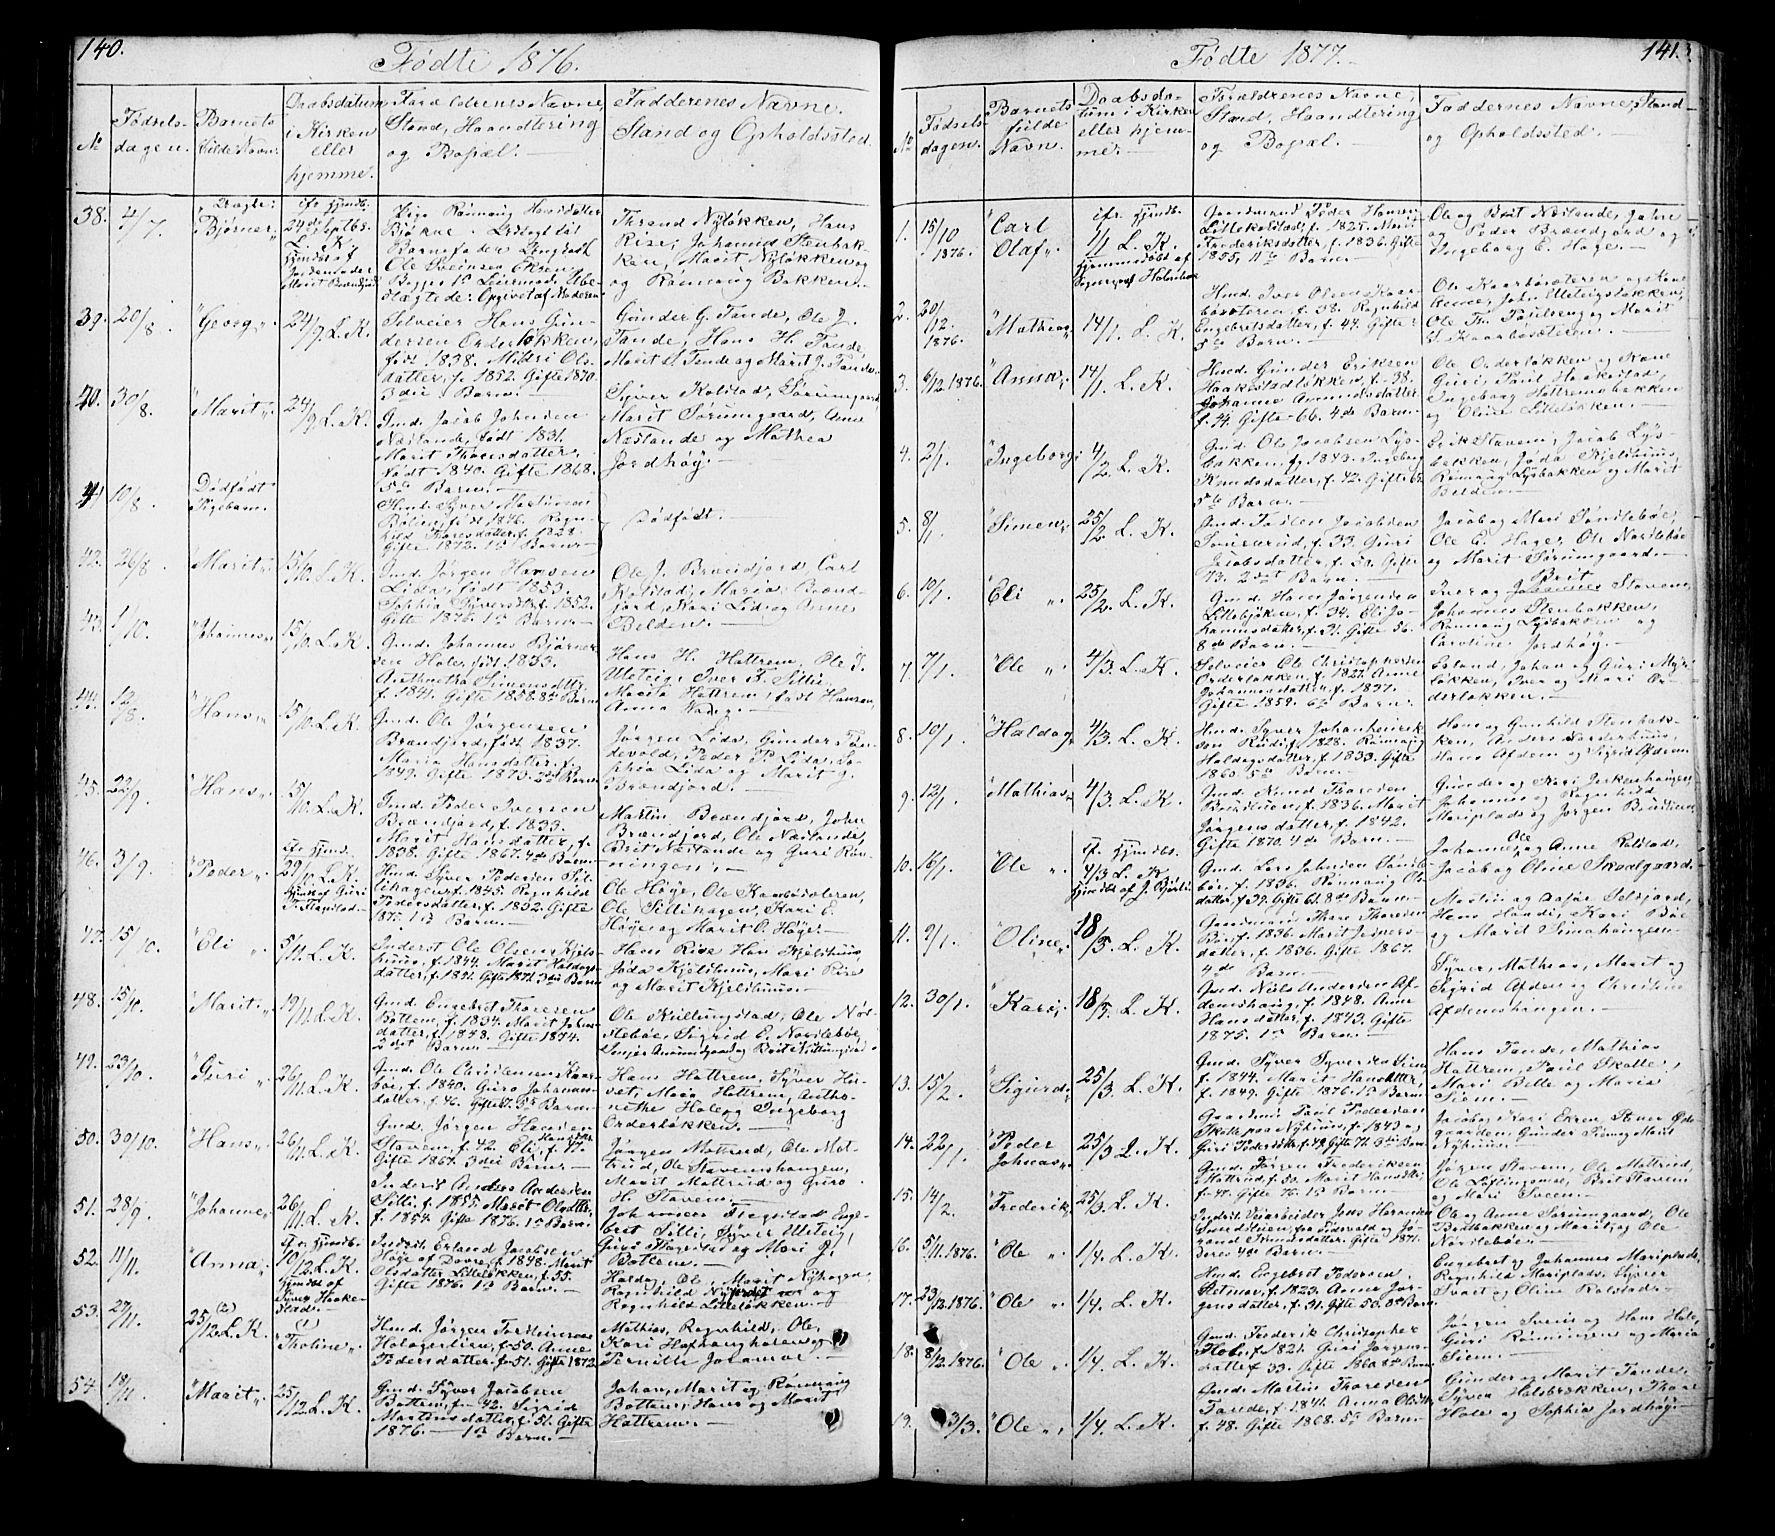 SAH, Lesja prestekontor, Klokkerbok nr. 5, 1850-1894, s. 140-141